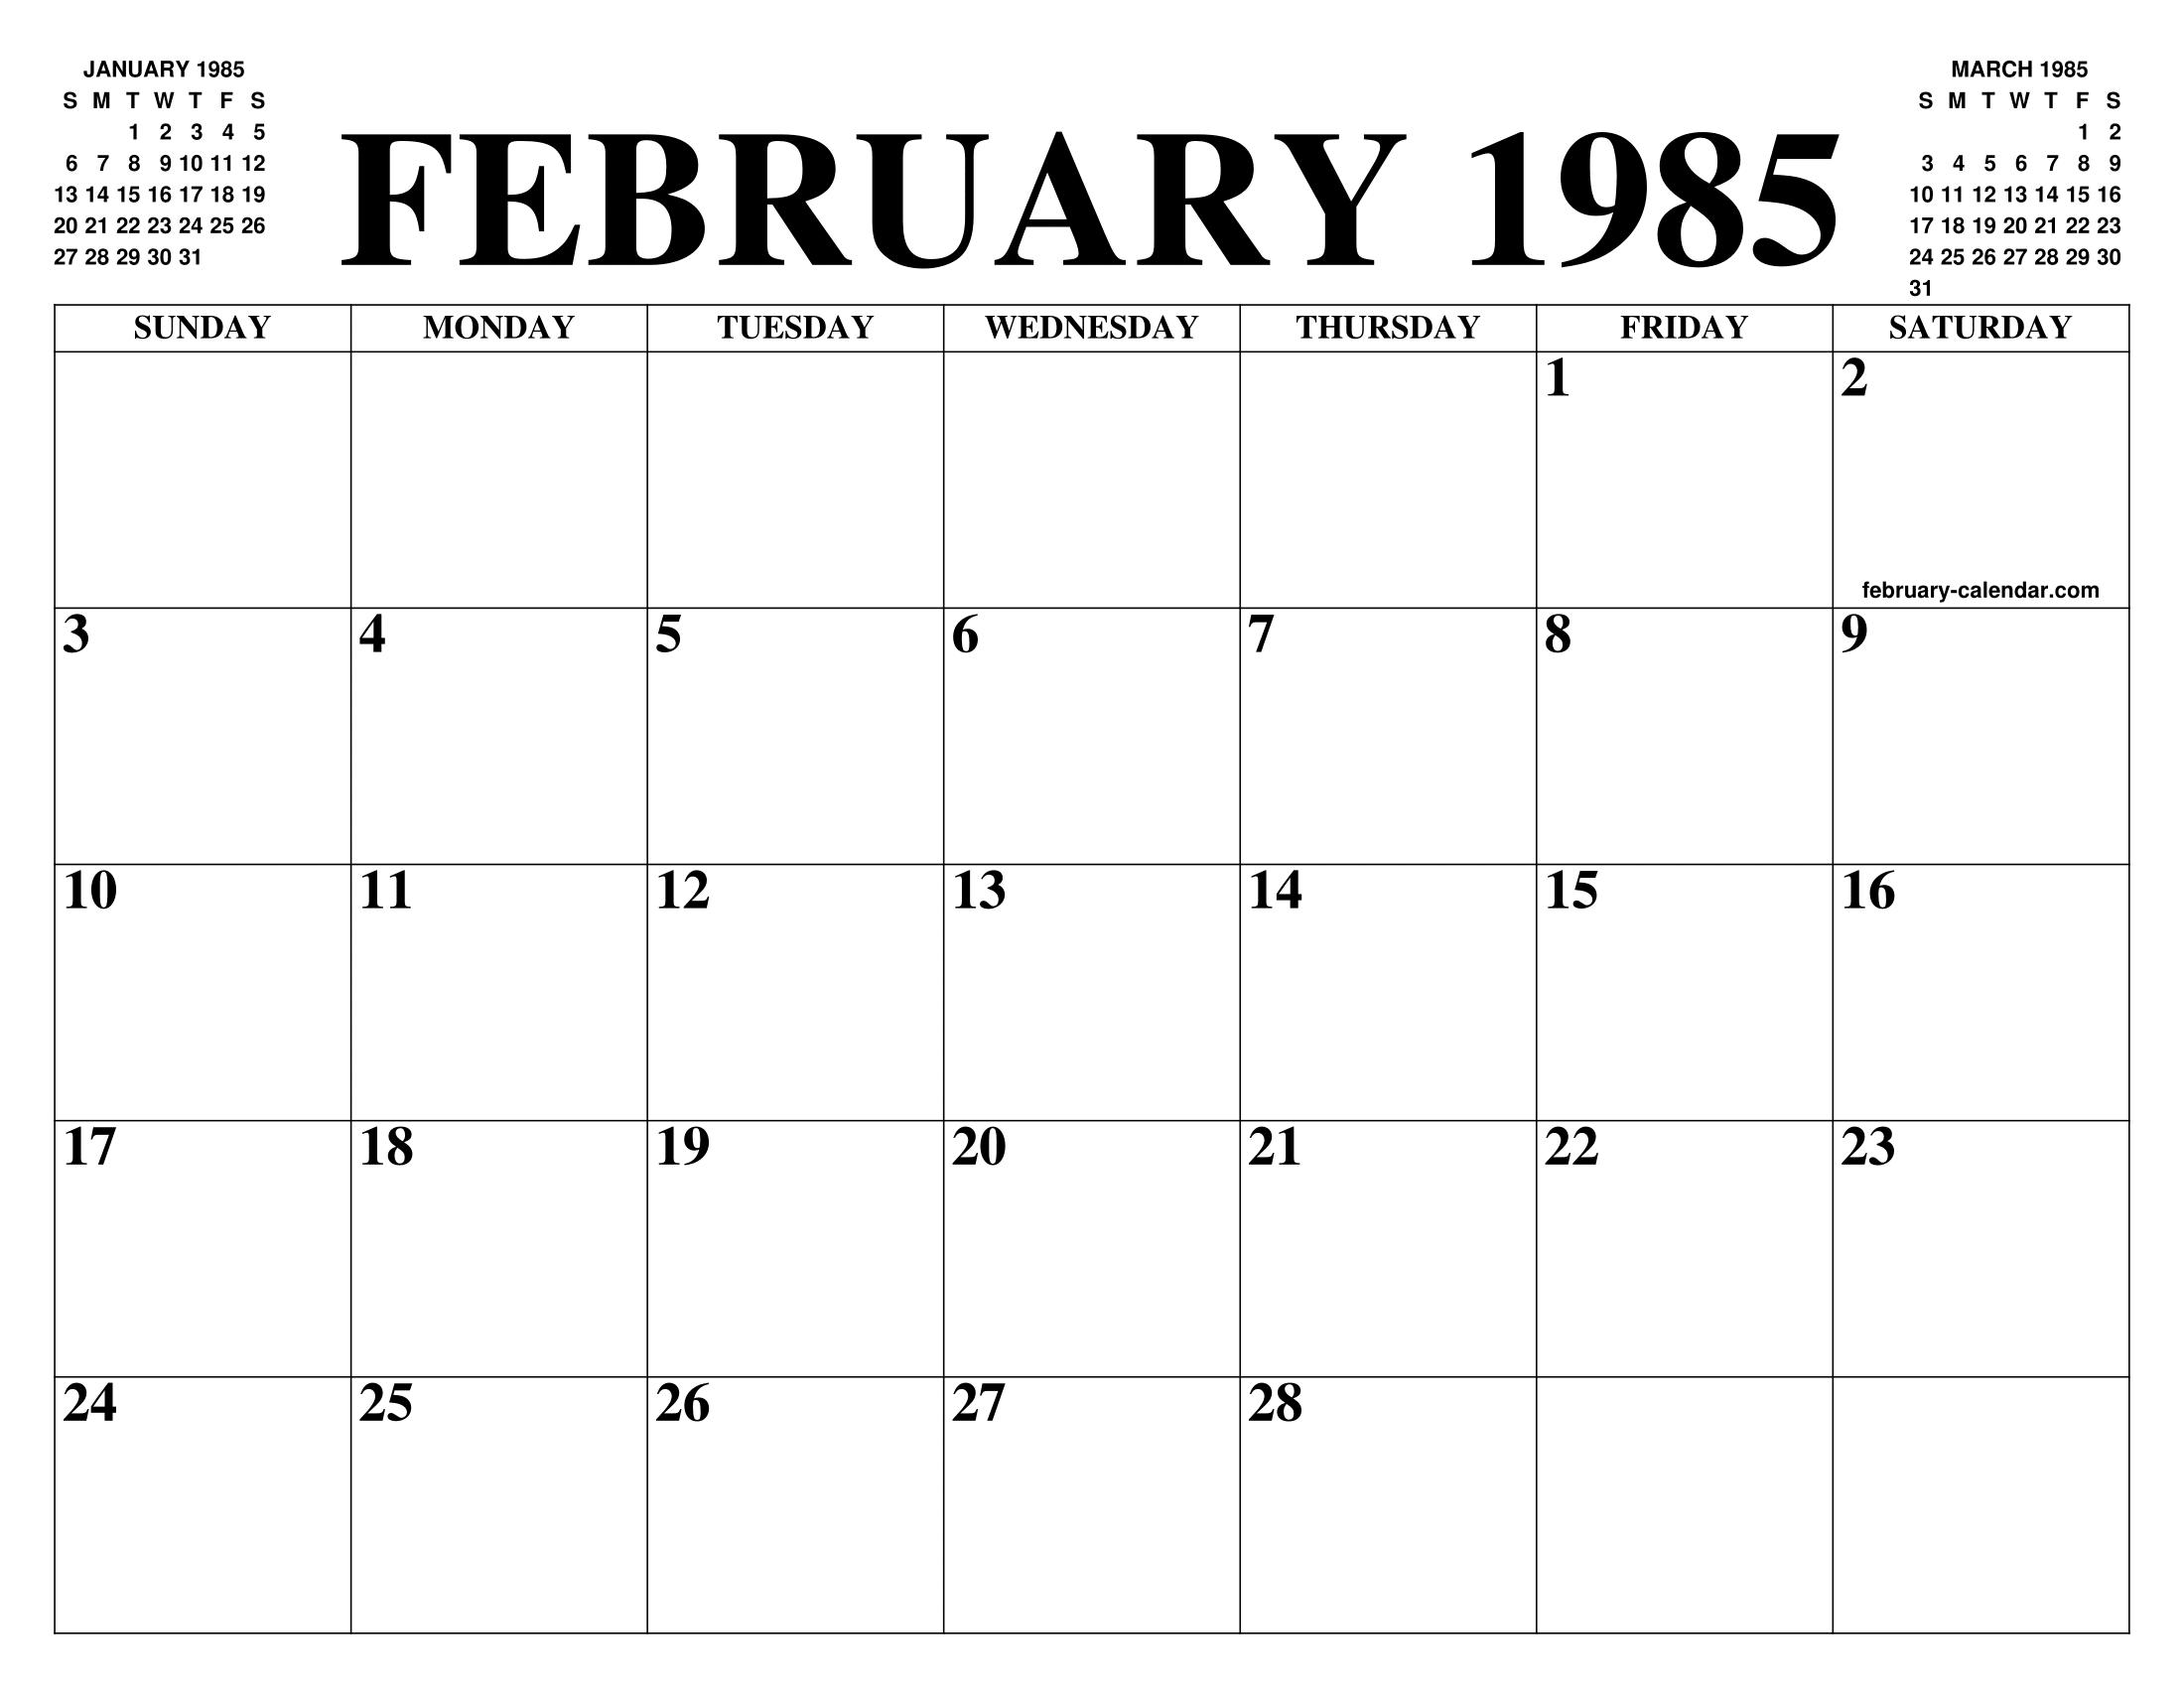 1985 Calendar.February 1985 Calendar Of The Month Free Printable February